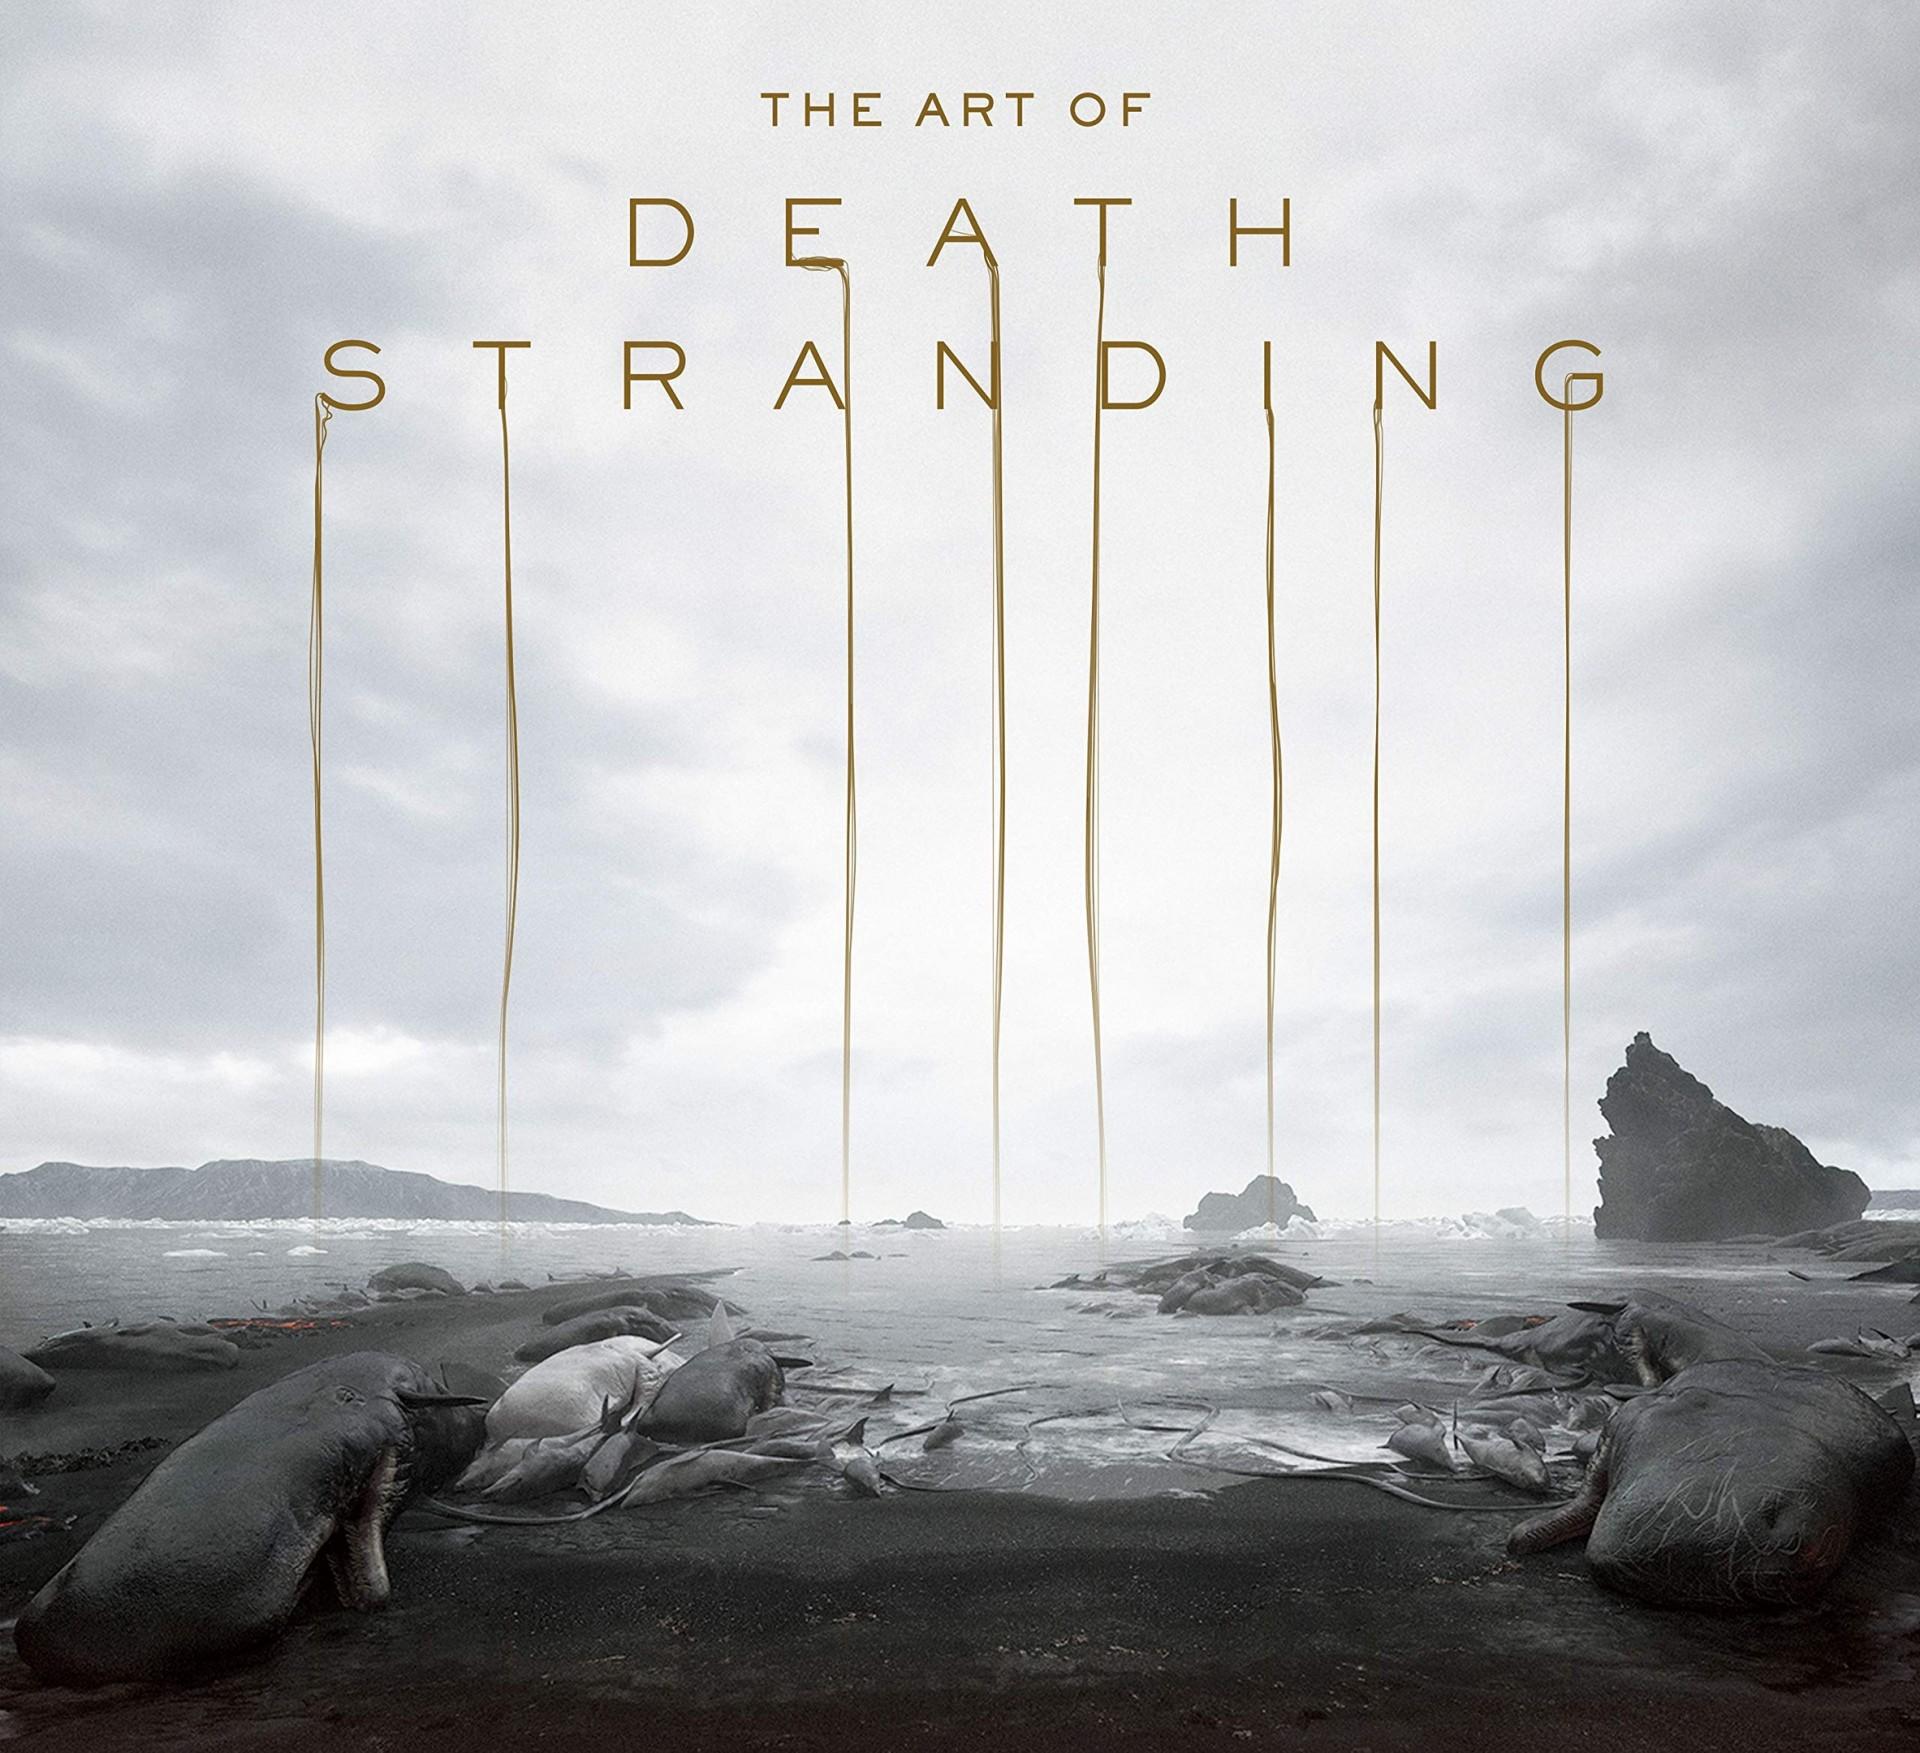 «Бегущий по лезвию 2019», Baldur's Gate и артбук Death Stranding — анонсы «Эксмо» с Comic Con 4